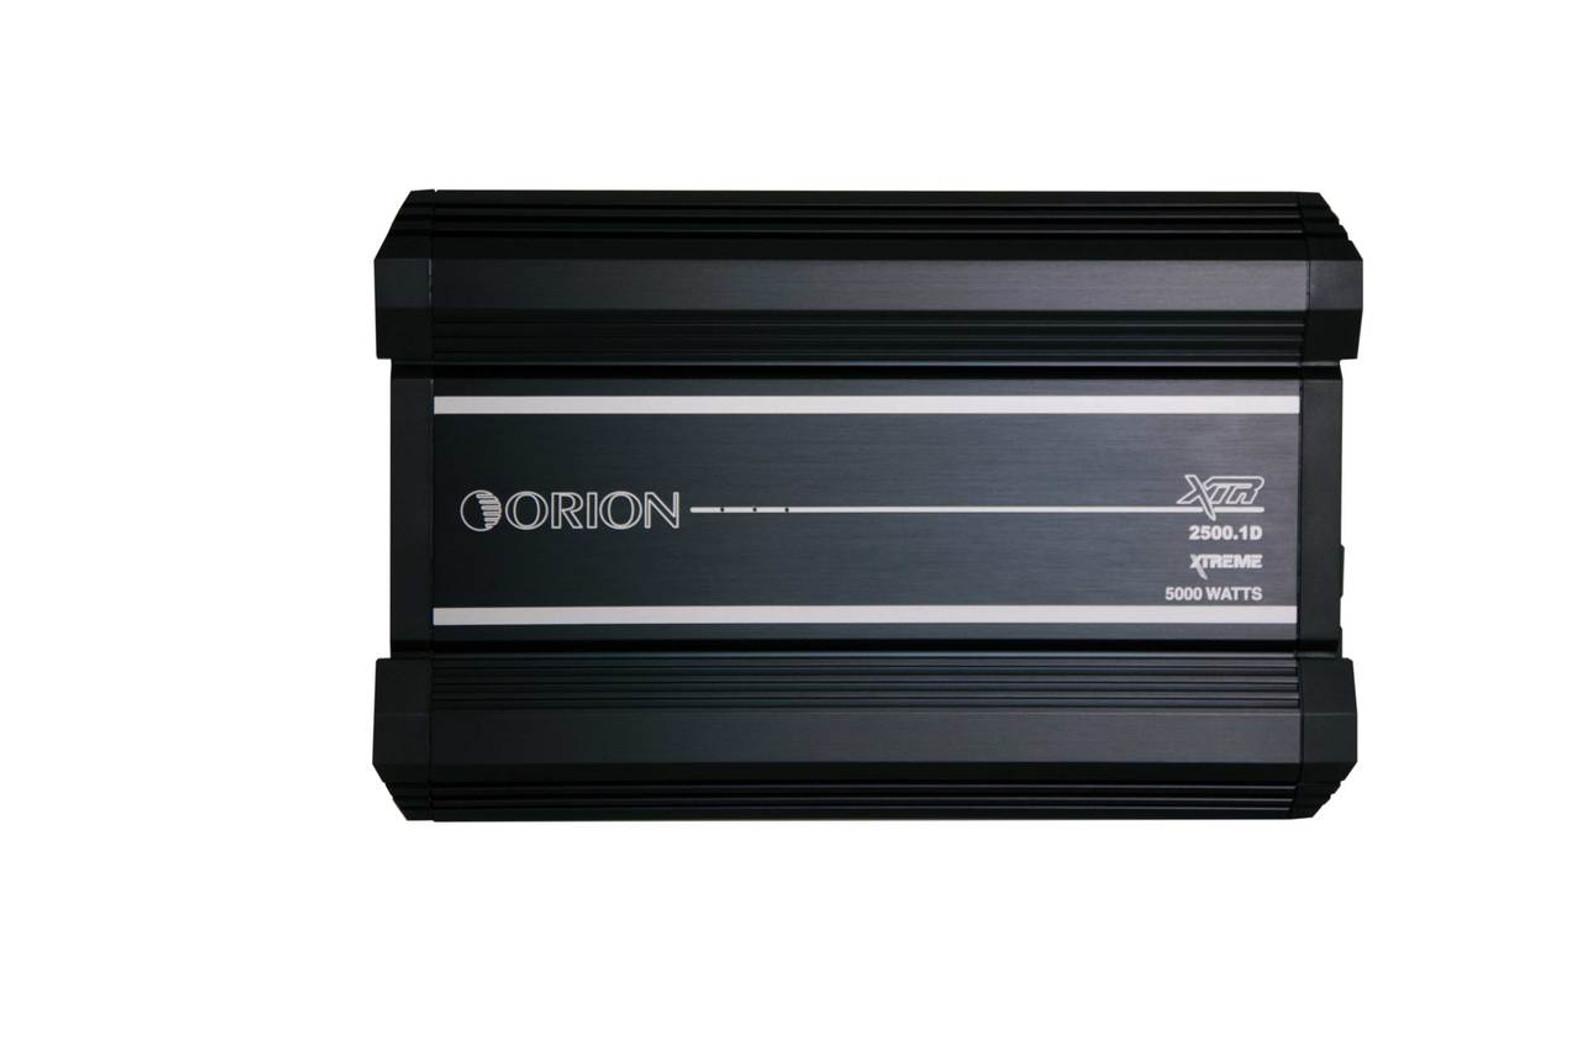 medium resolution of orion xtr xtr2500 1dz class d amplifier 2500 watts rms 1 ohm ssa orion amplifier wiring diagram source orion car audio